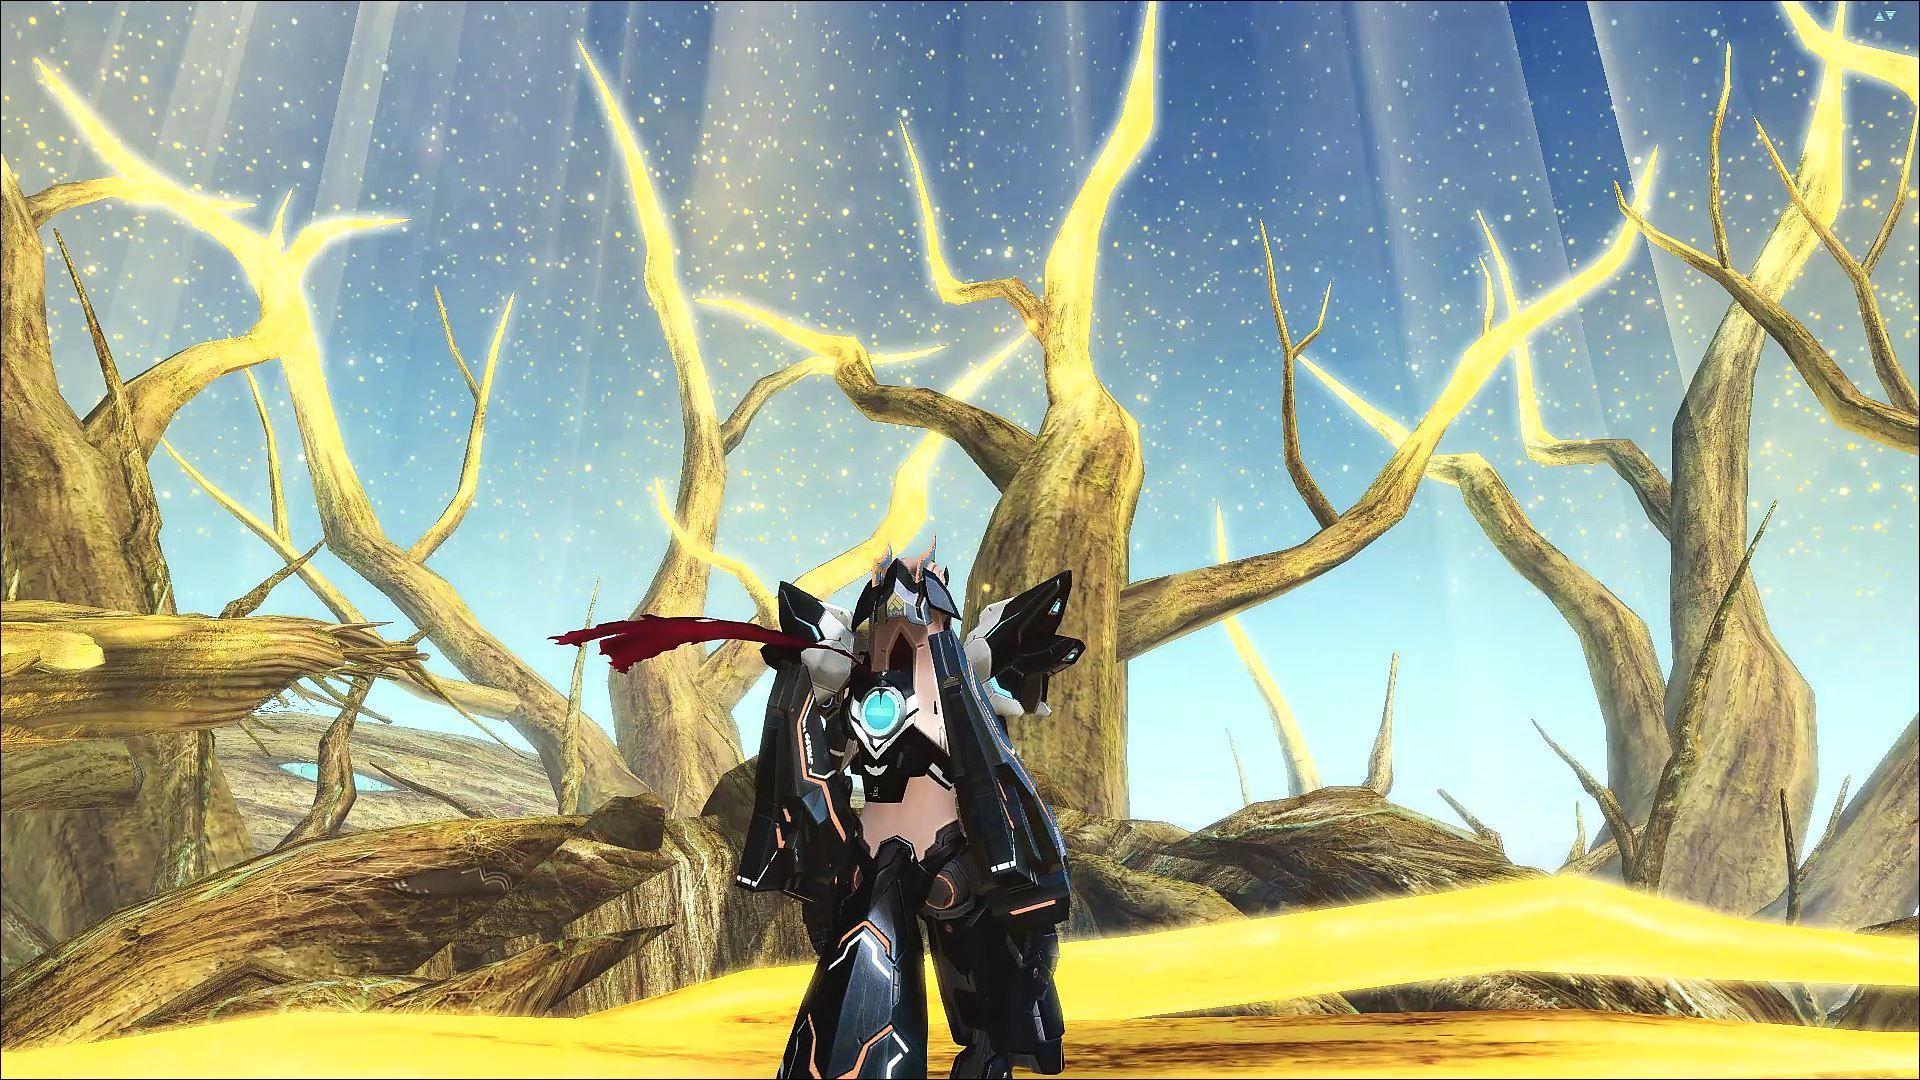 Phantasy Star Online 2 000245681.jpg